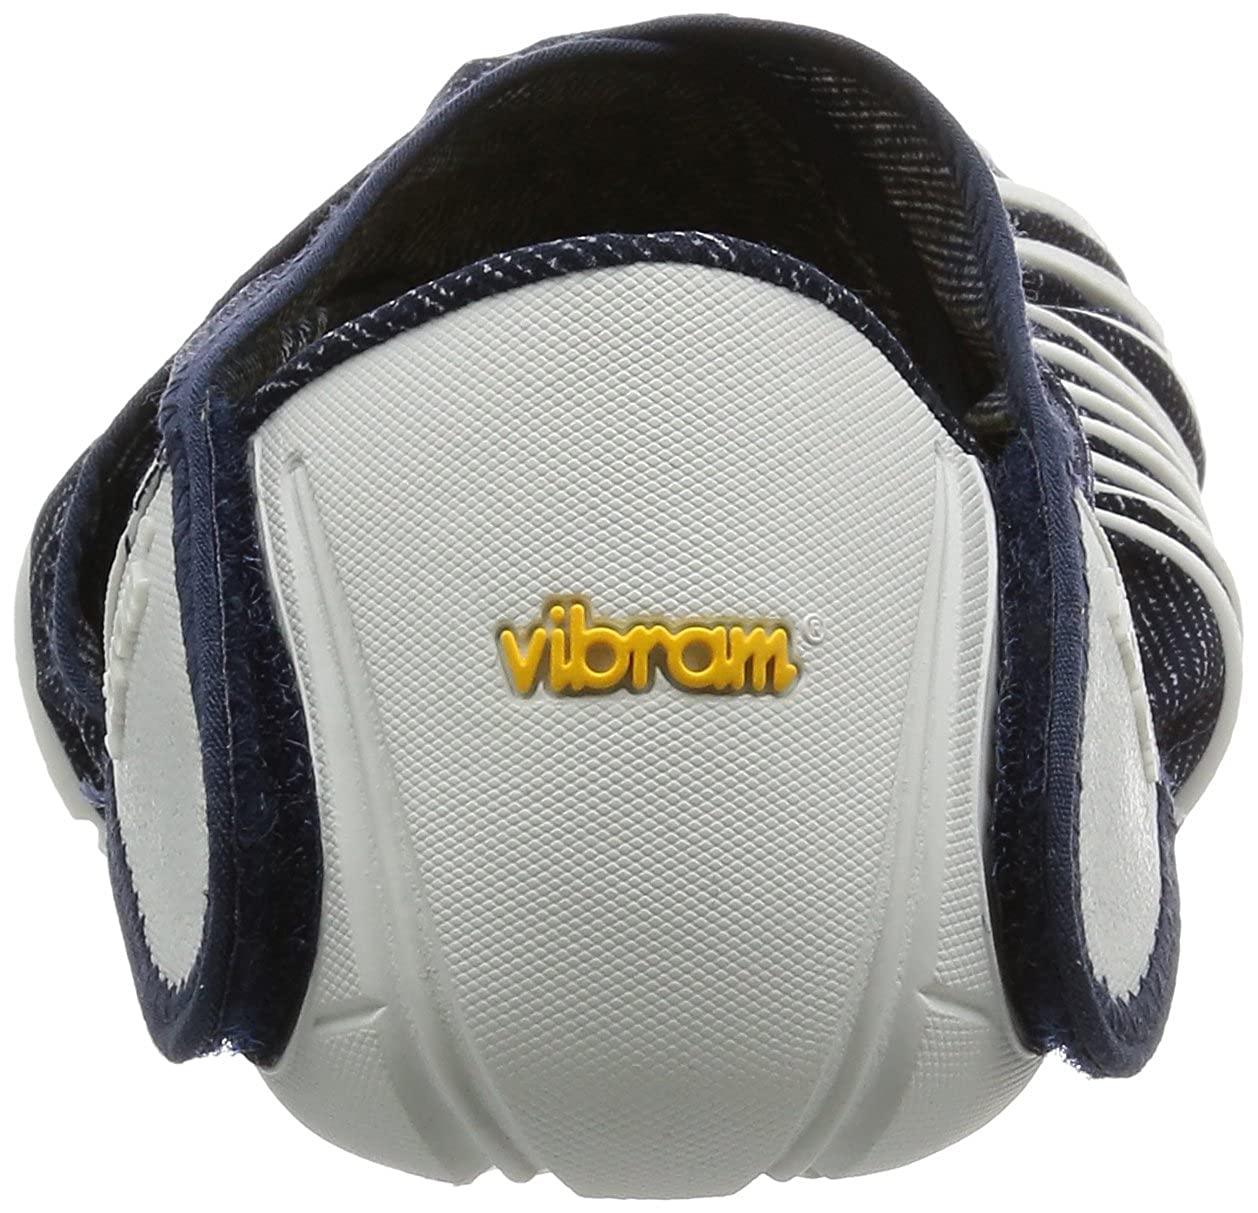 Vibram Mens and Womens Furoshiki Phulkari Sneaker